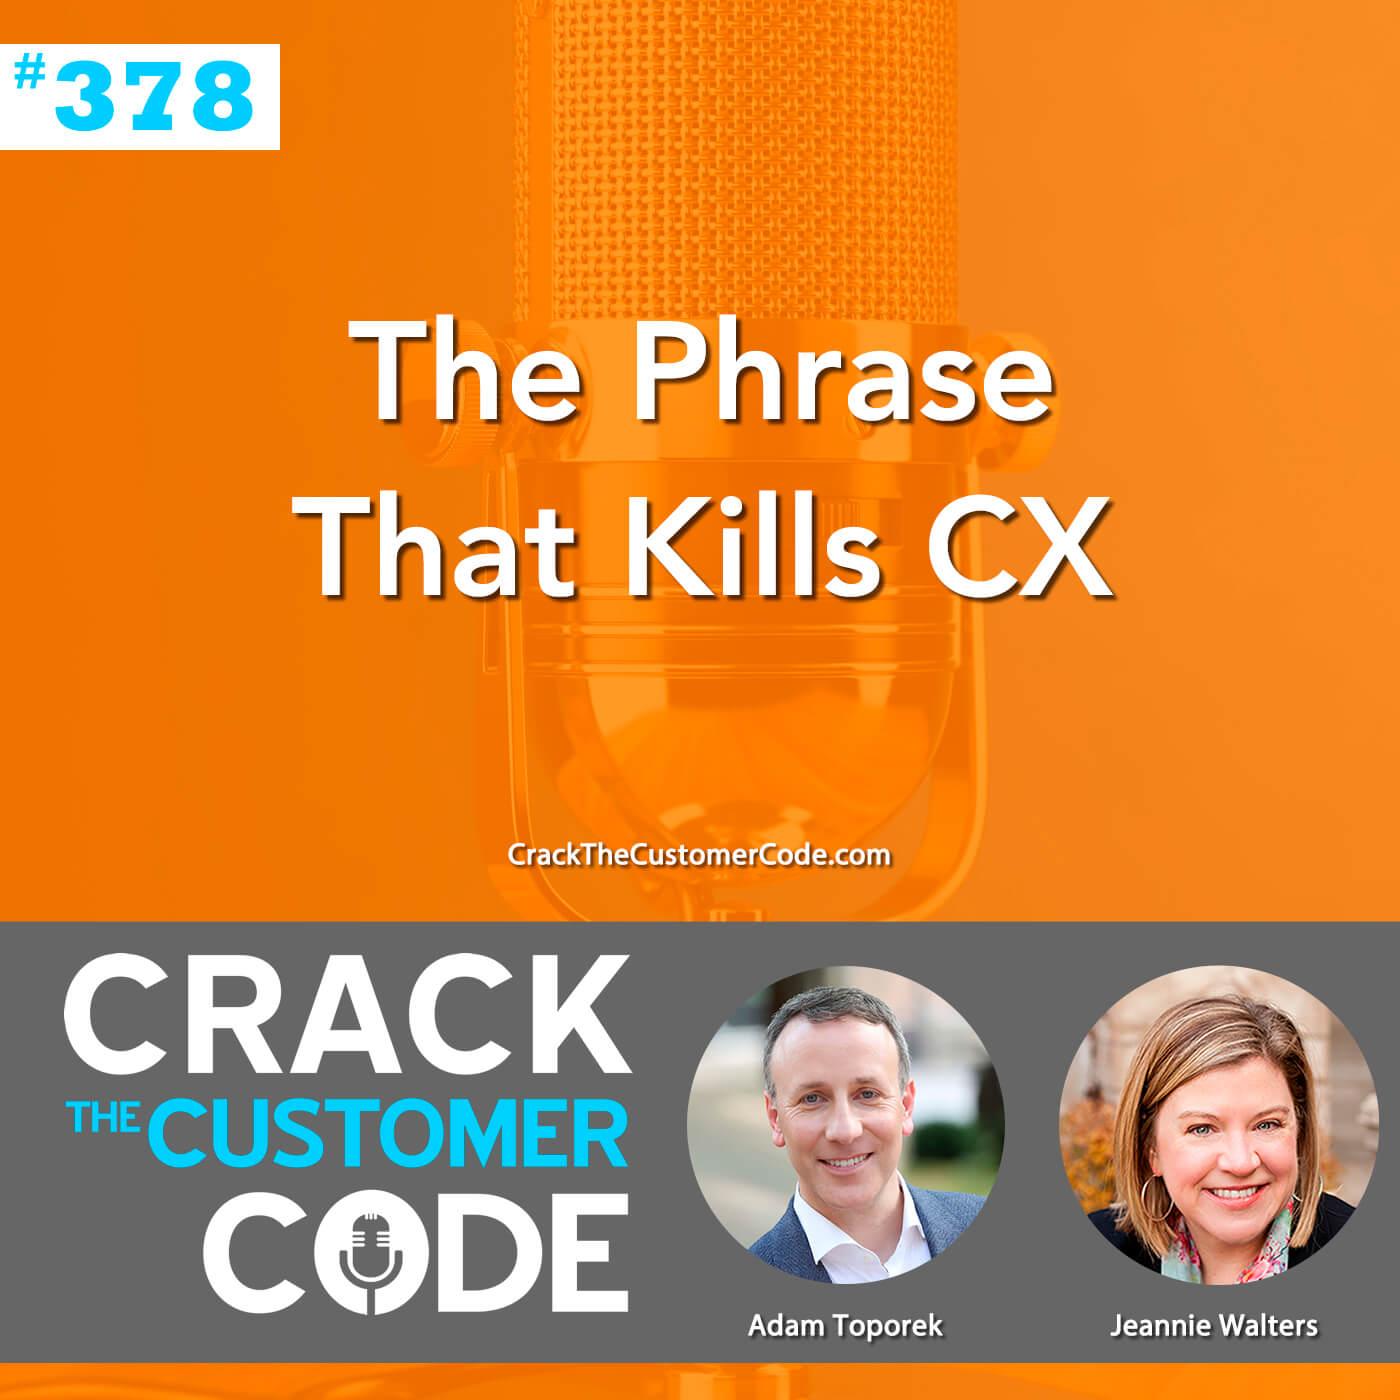 378: The Phrase That Kills CX